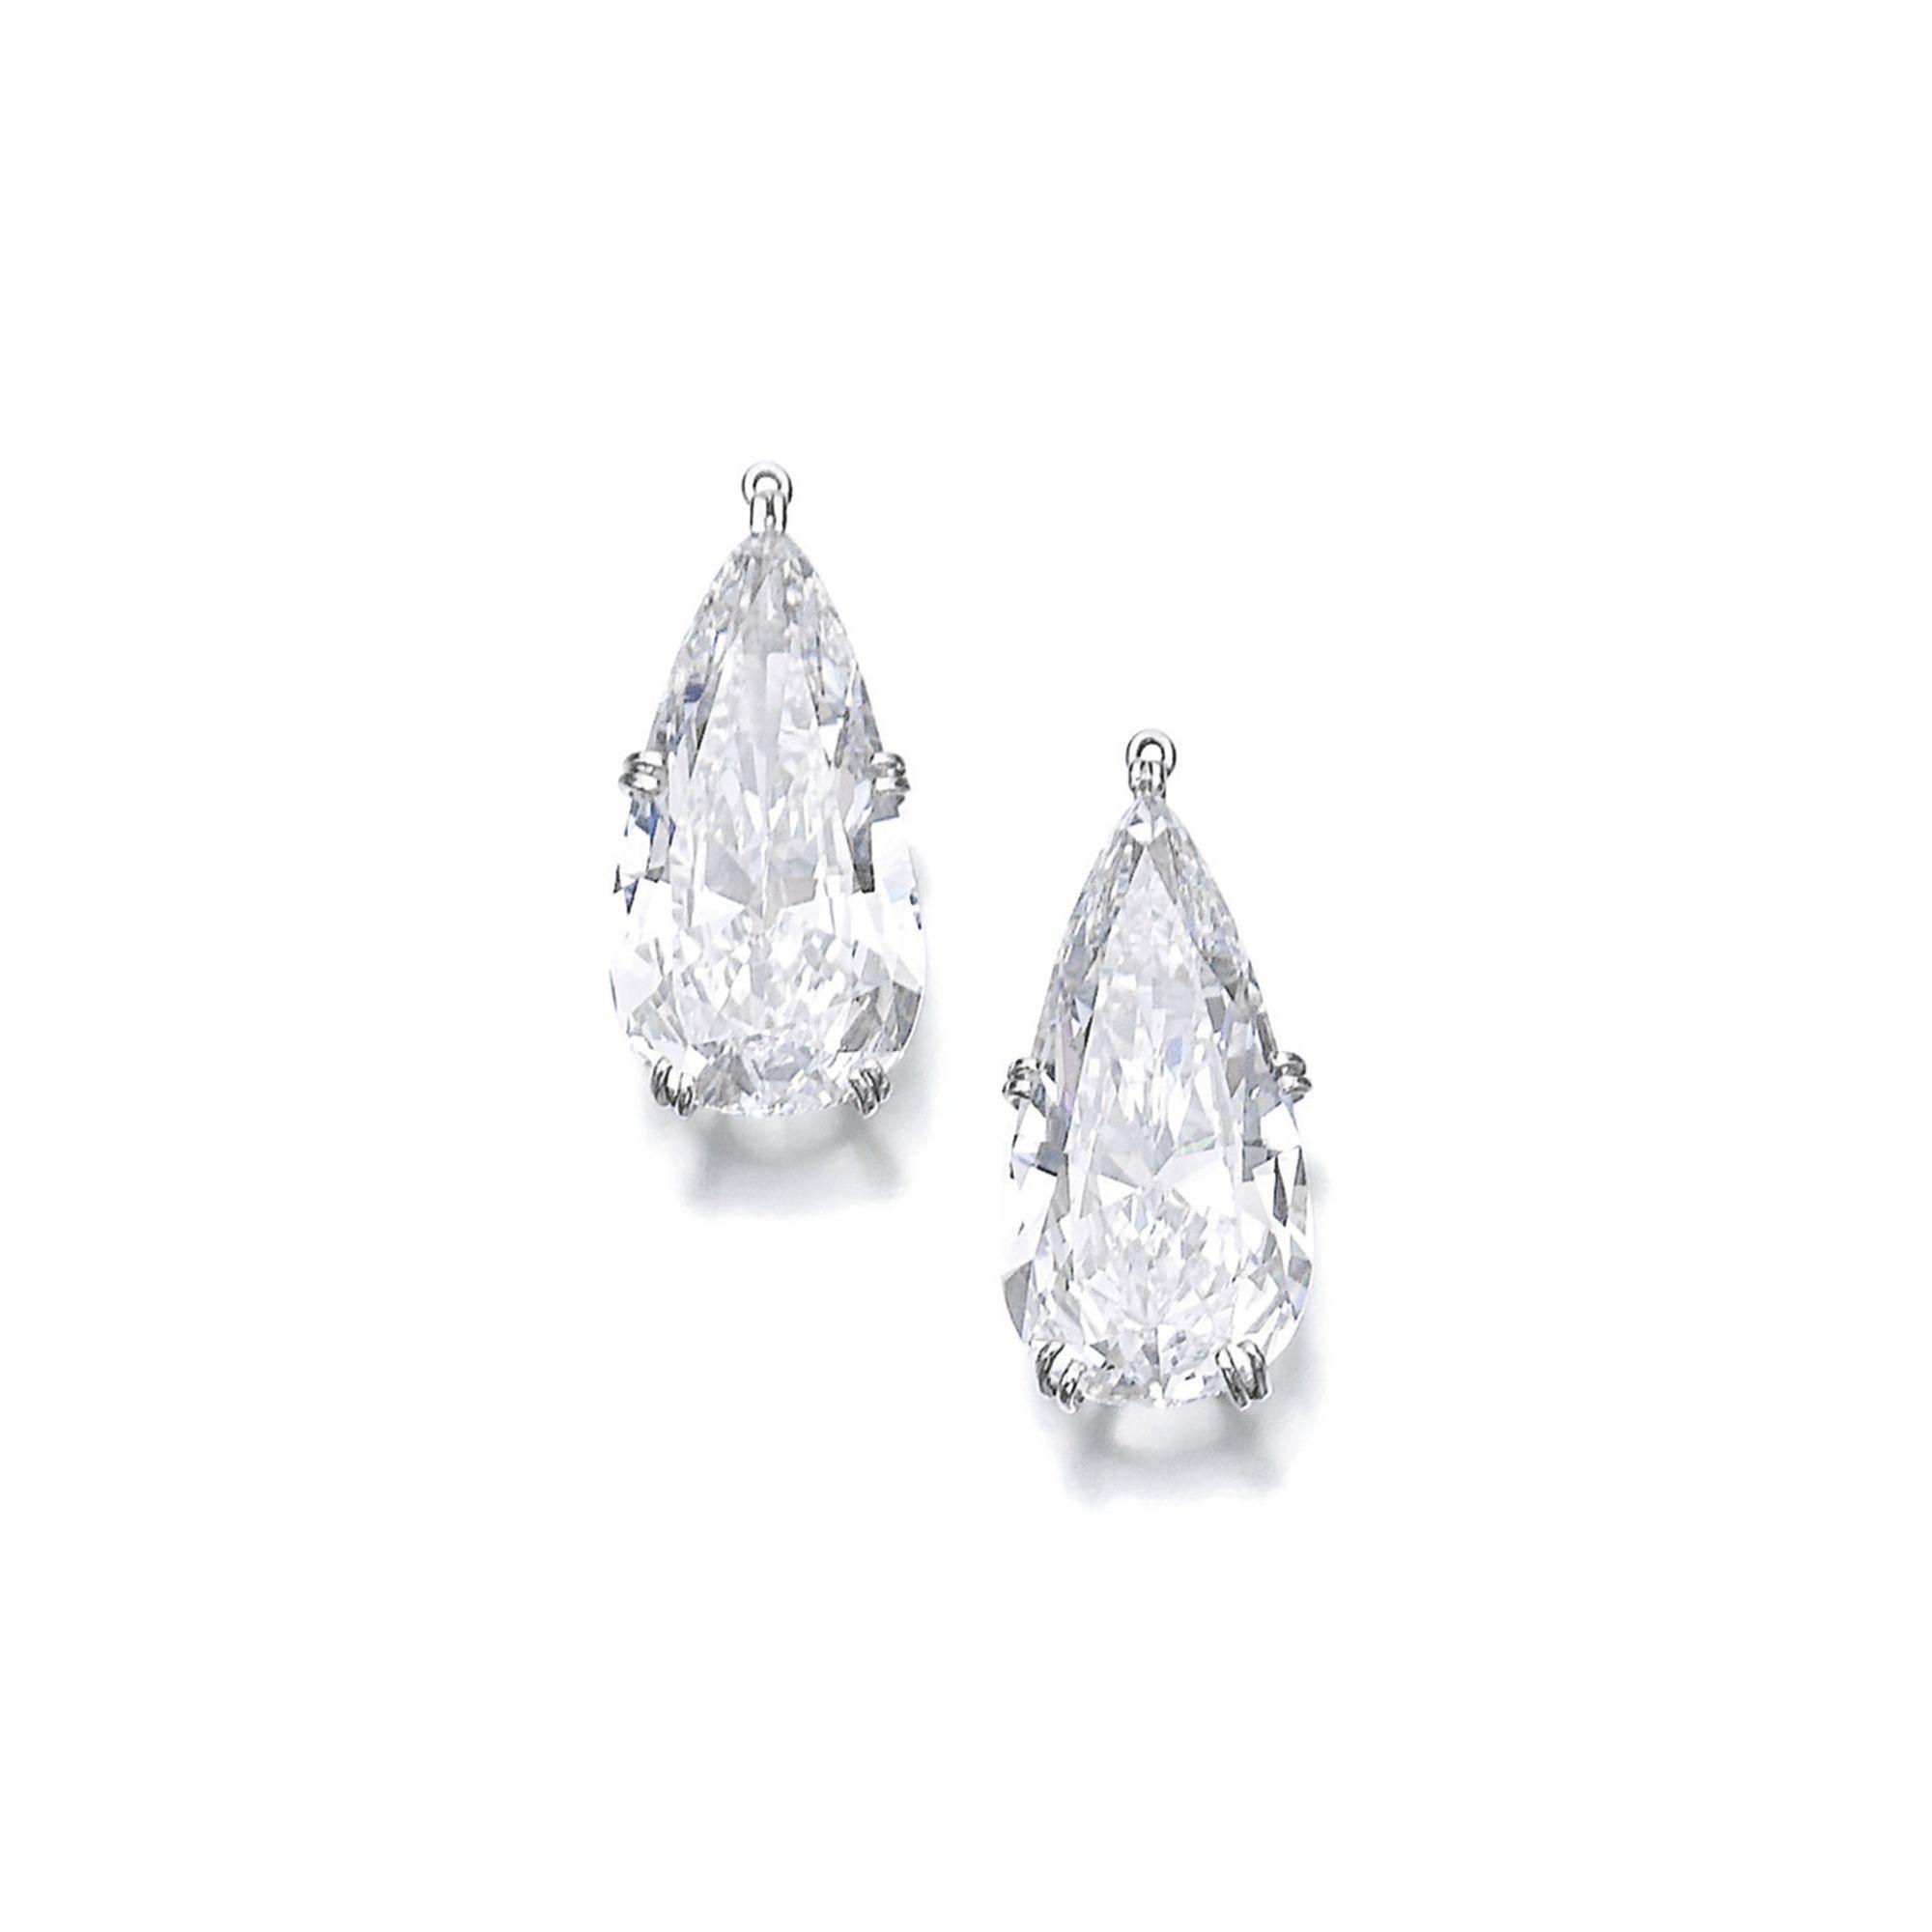 Pair of diamond pendants lot sothebyus set with pearshaped